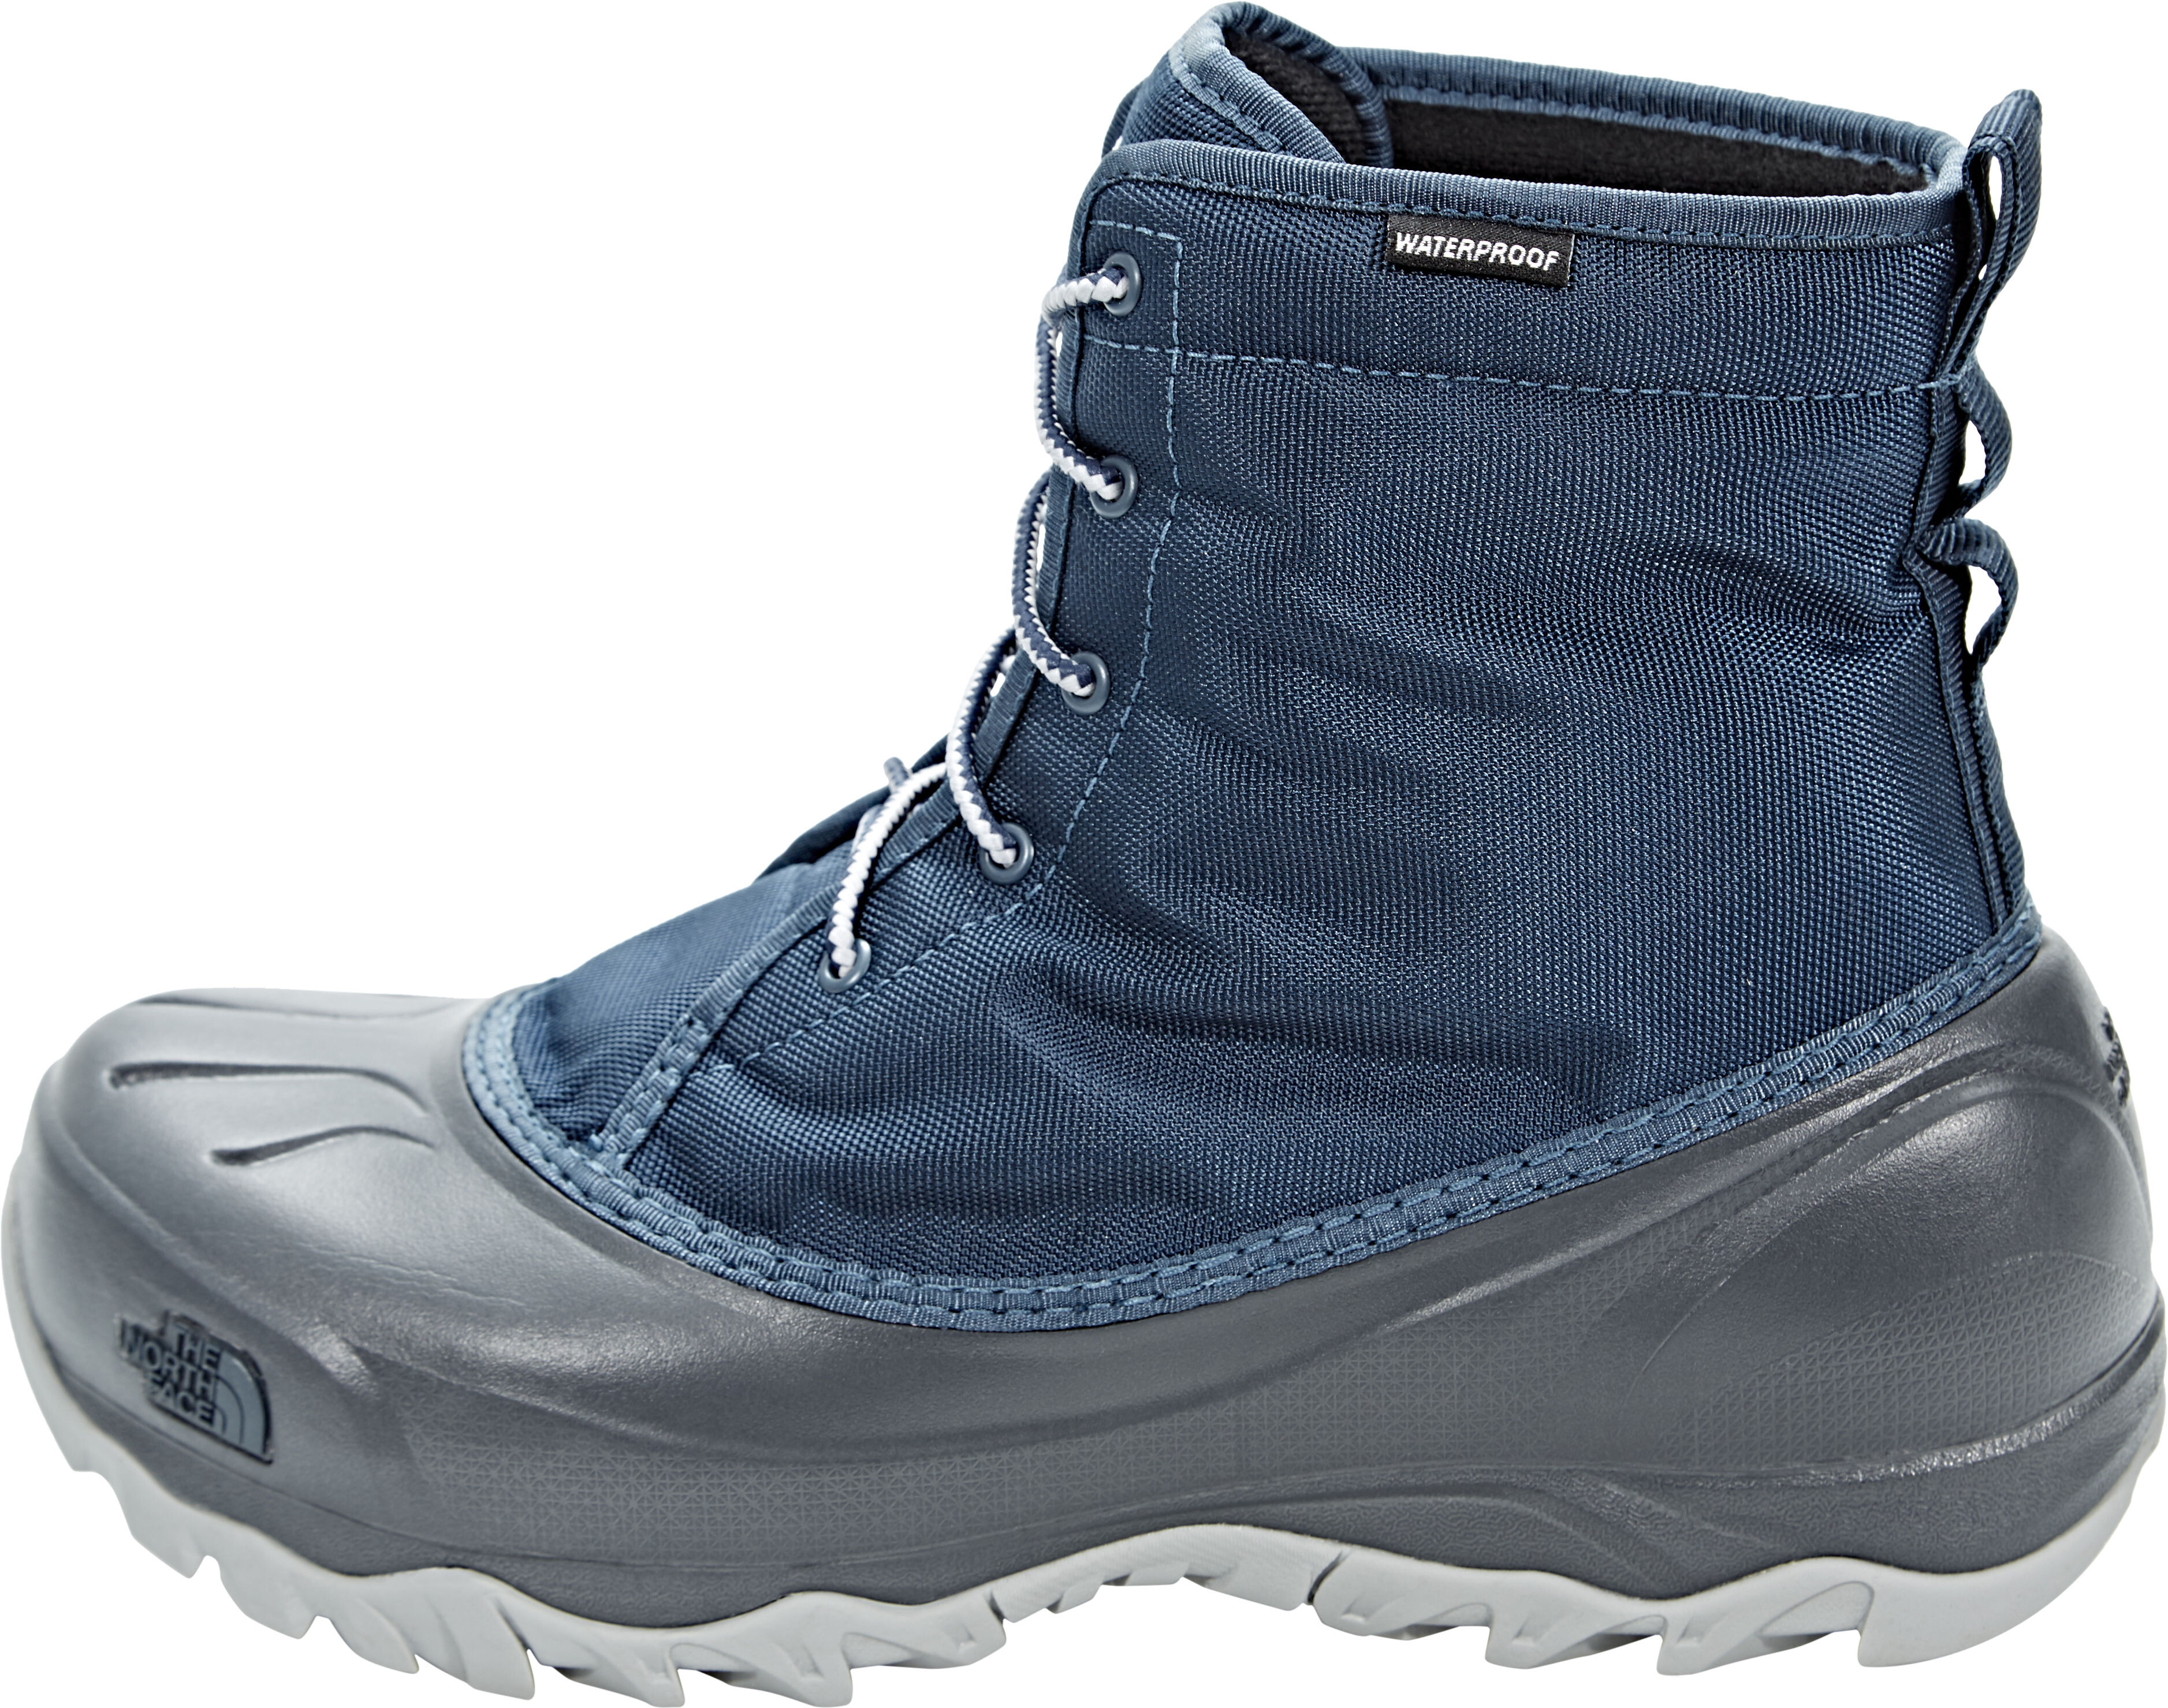 8f7f7ed1a8b The North Face Tsumoru Boots Women tnf black/dark gull grey